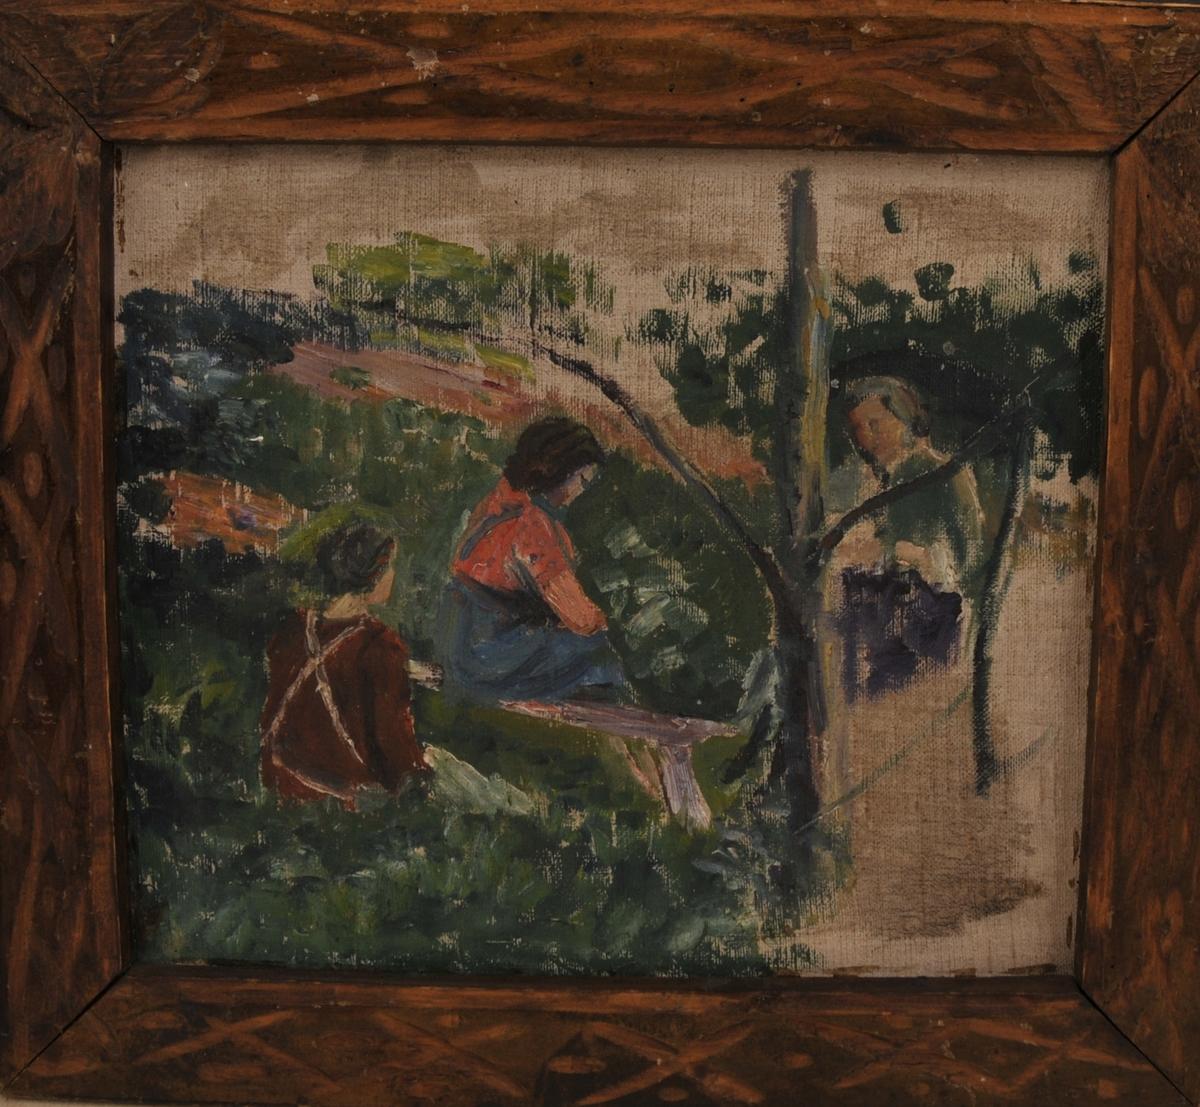 Kvinner som sit ute i hagen eller eit anna landskap, den eine kvinna sit på ein benk.